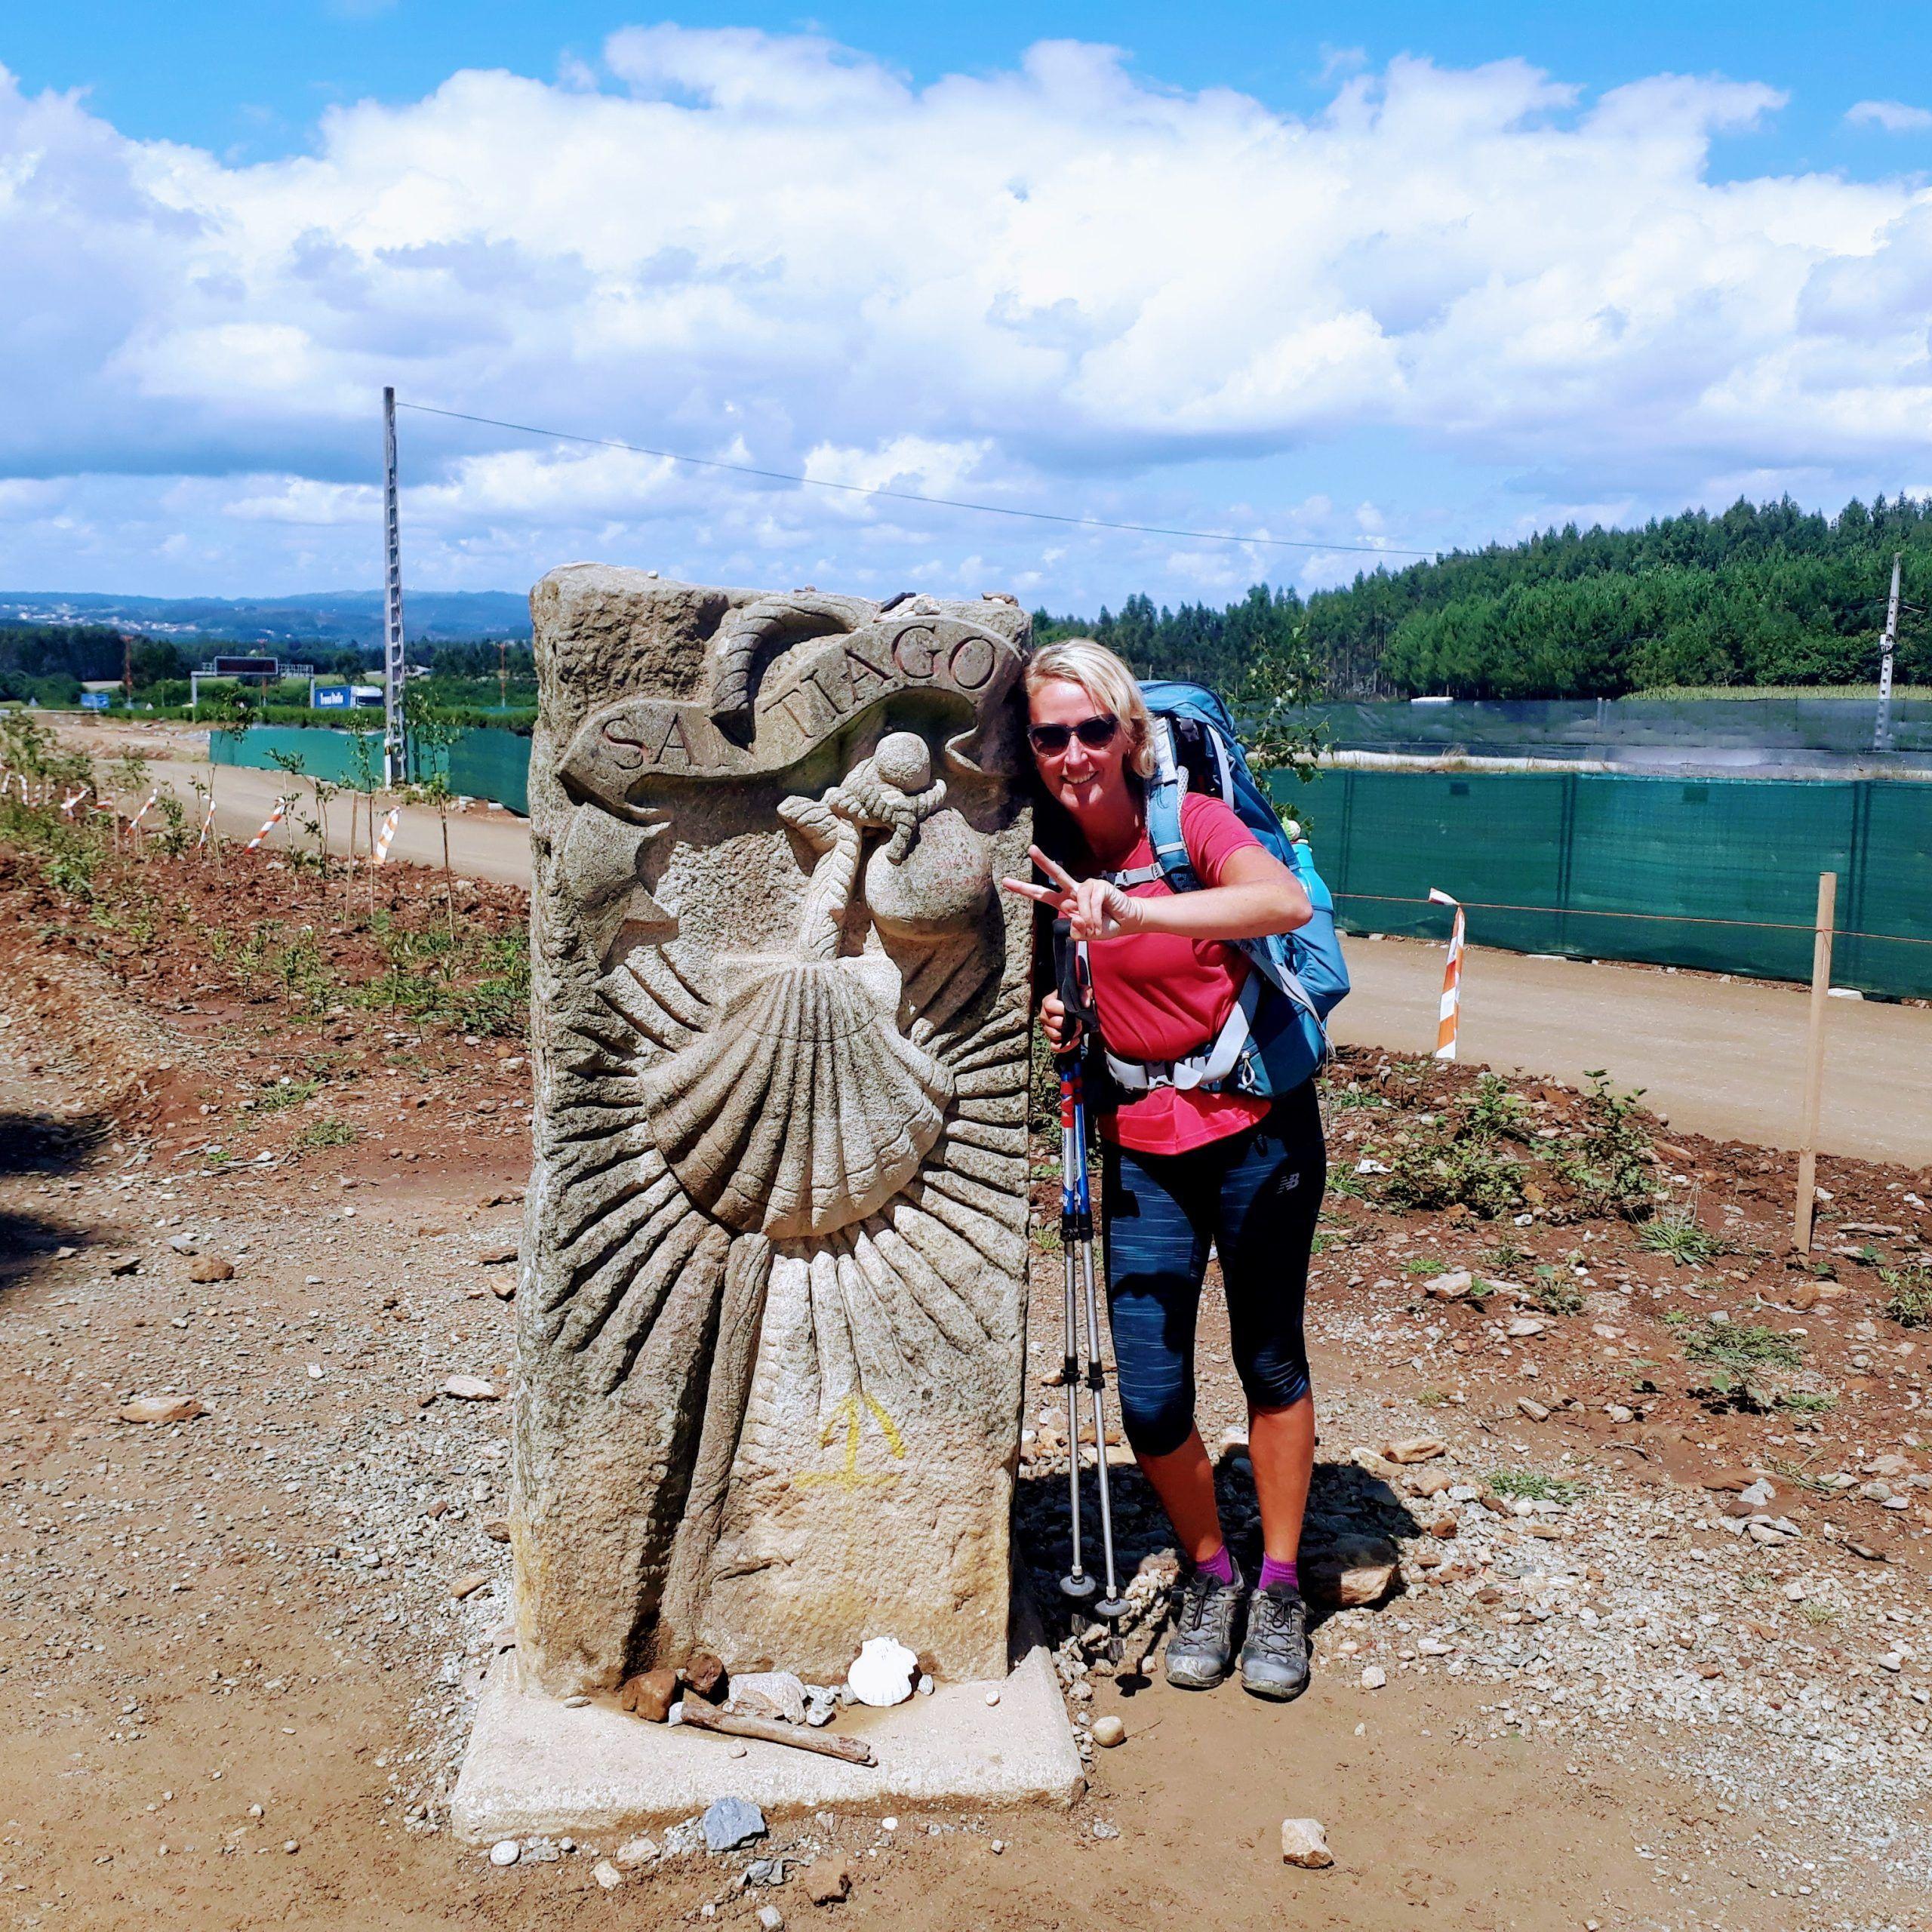 Day 5 Melide - Arzua 18 km